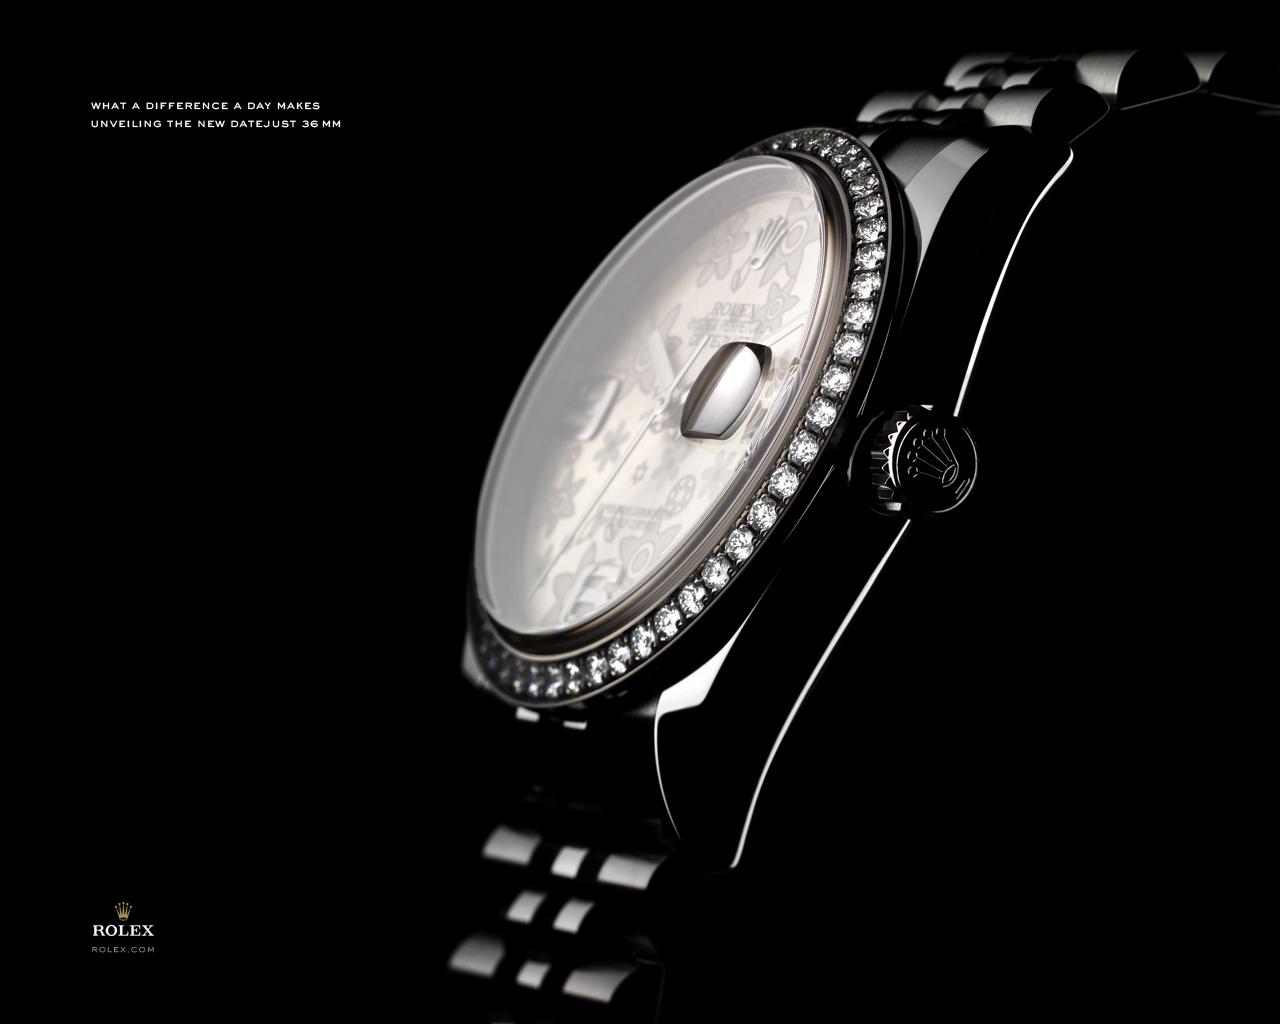 Good Rolex Wallpaper - VnXT7i Image_75633.jpg